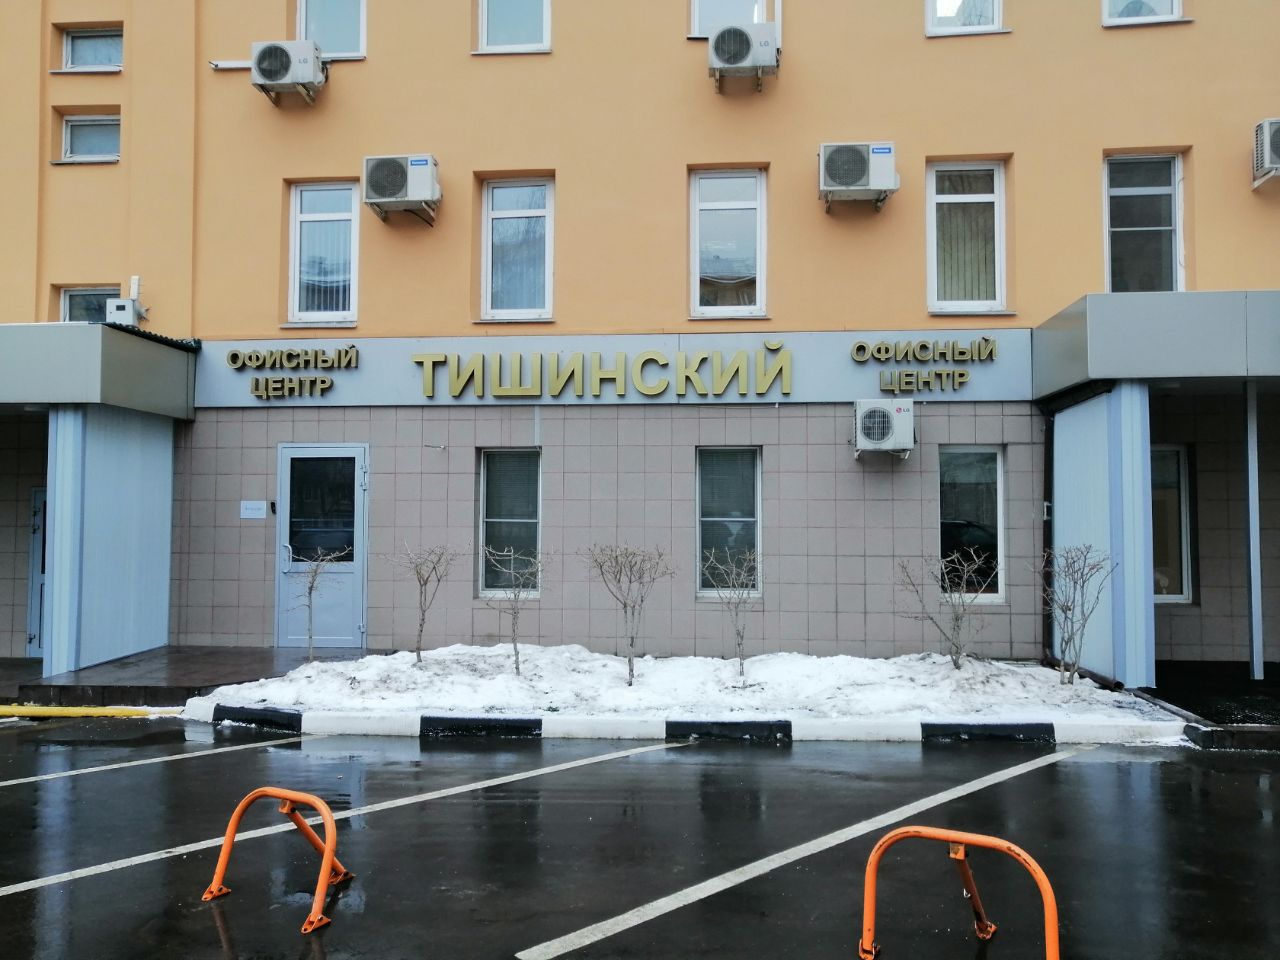 Бизнес Центр Тишинский